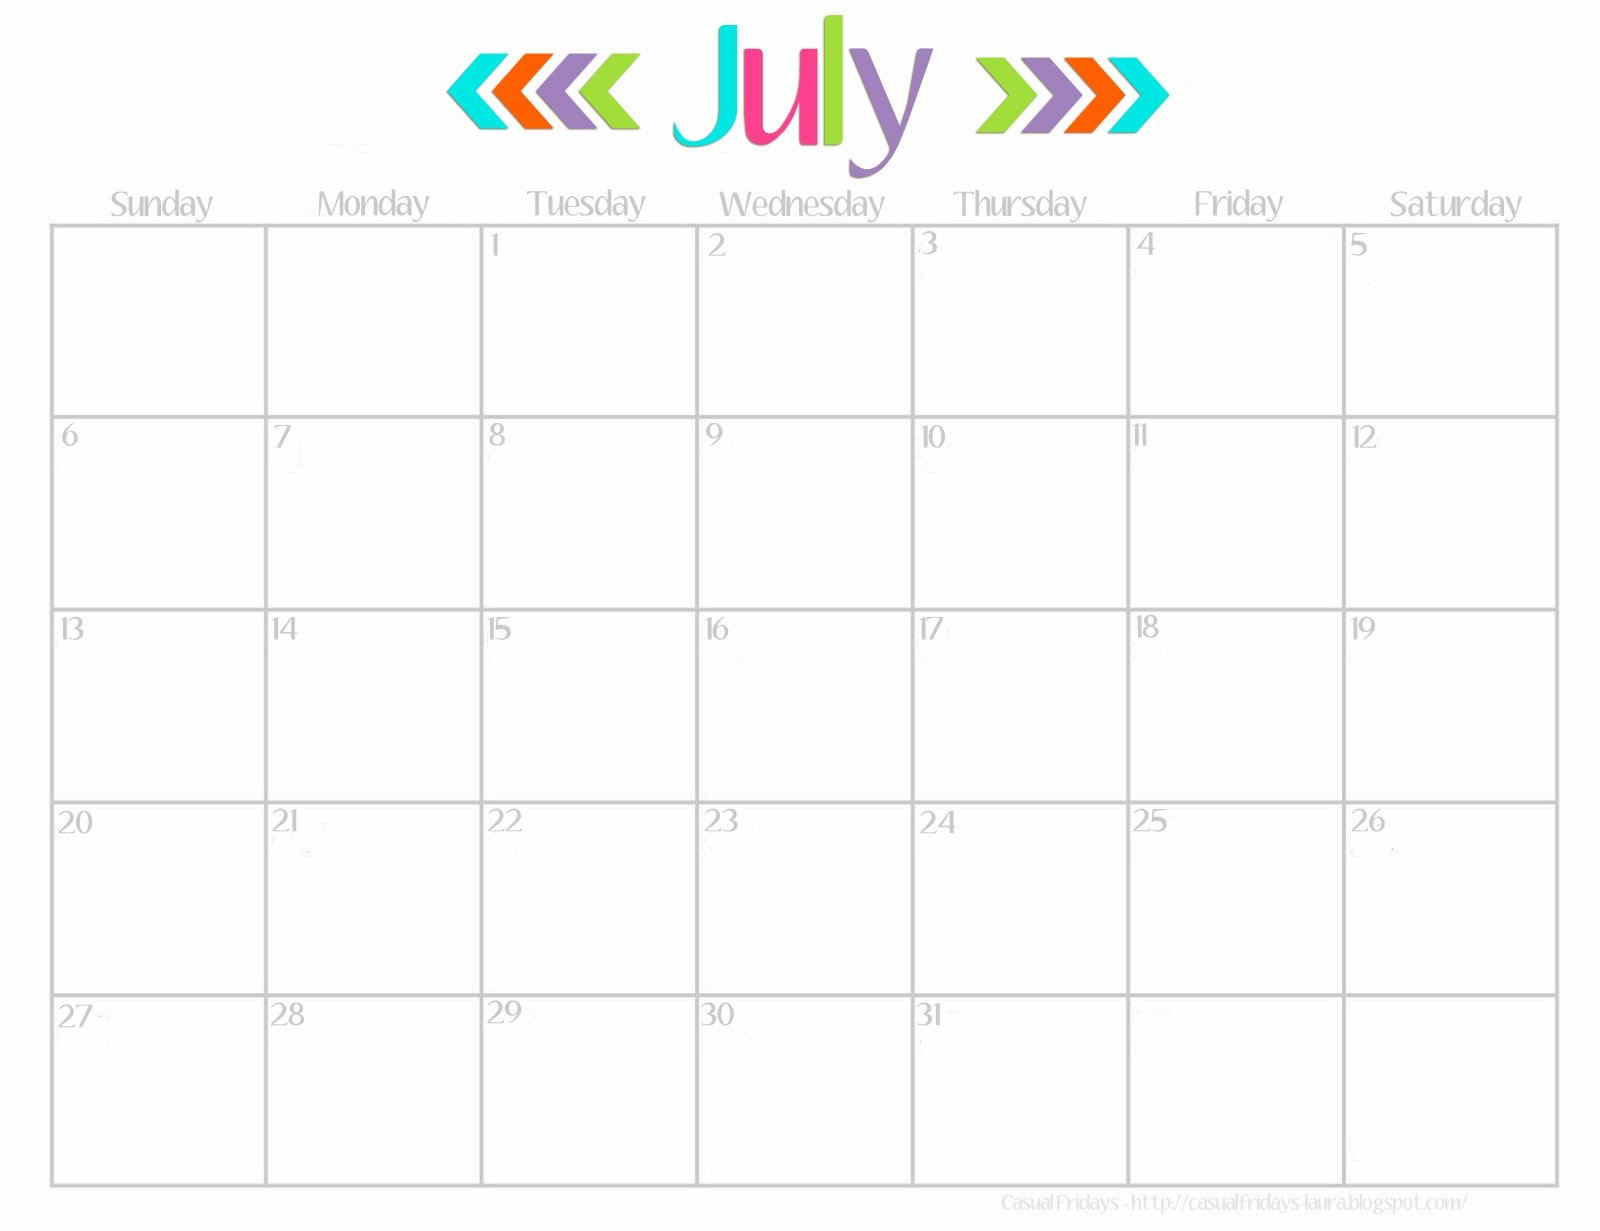 cute calendar template Lovely Cute July 2016 Calendar